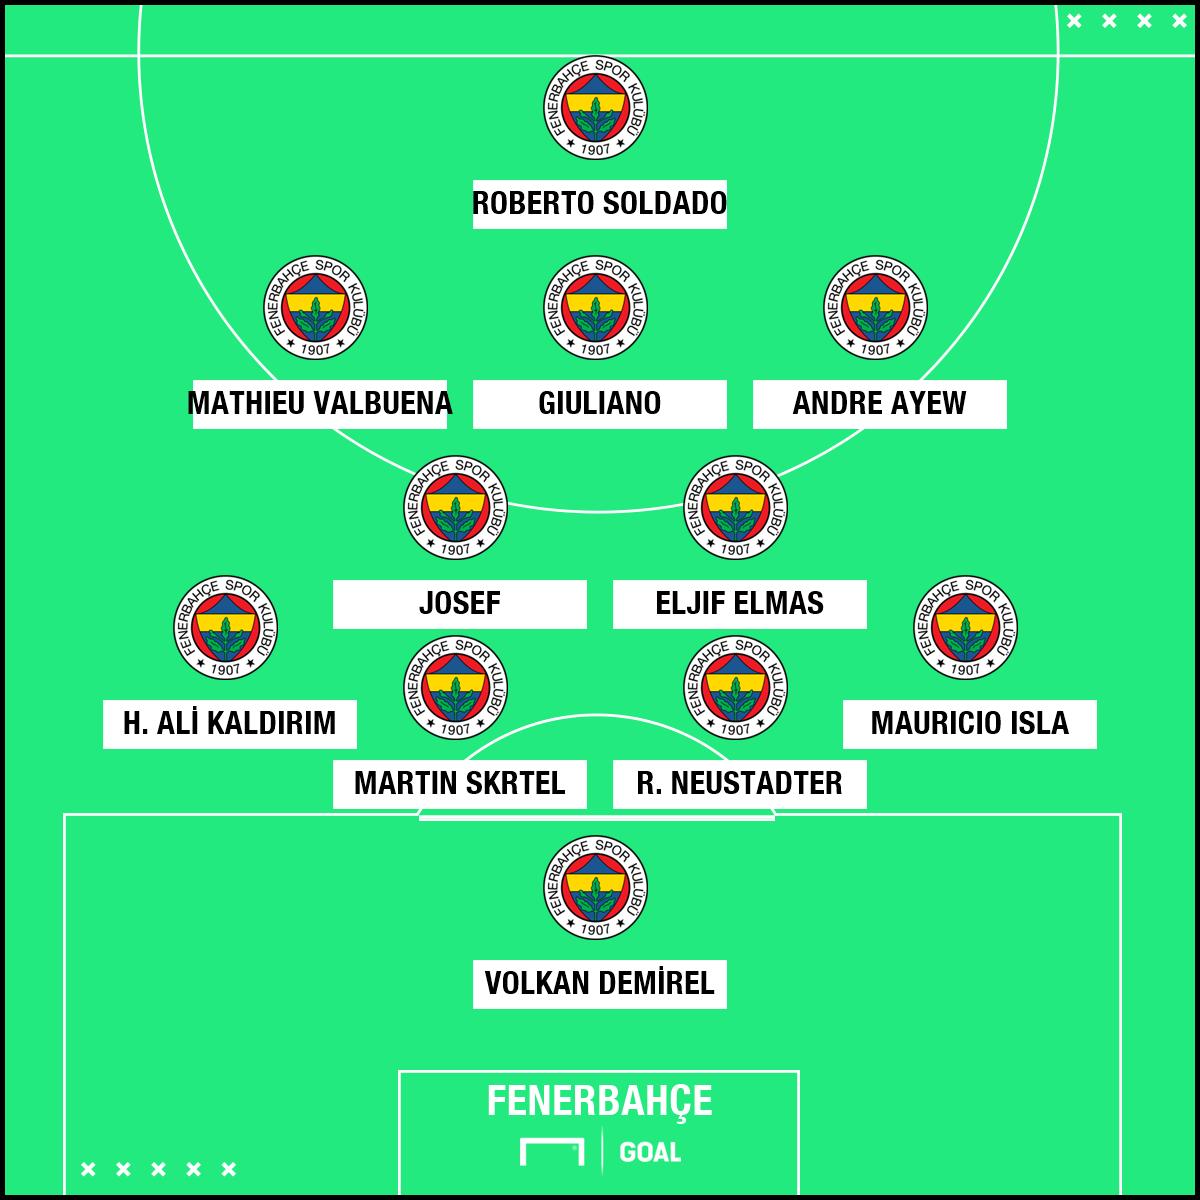 Fenerbahce 2018/2019